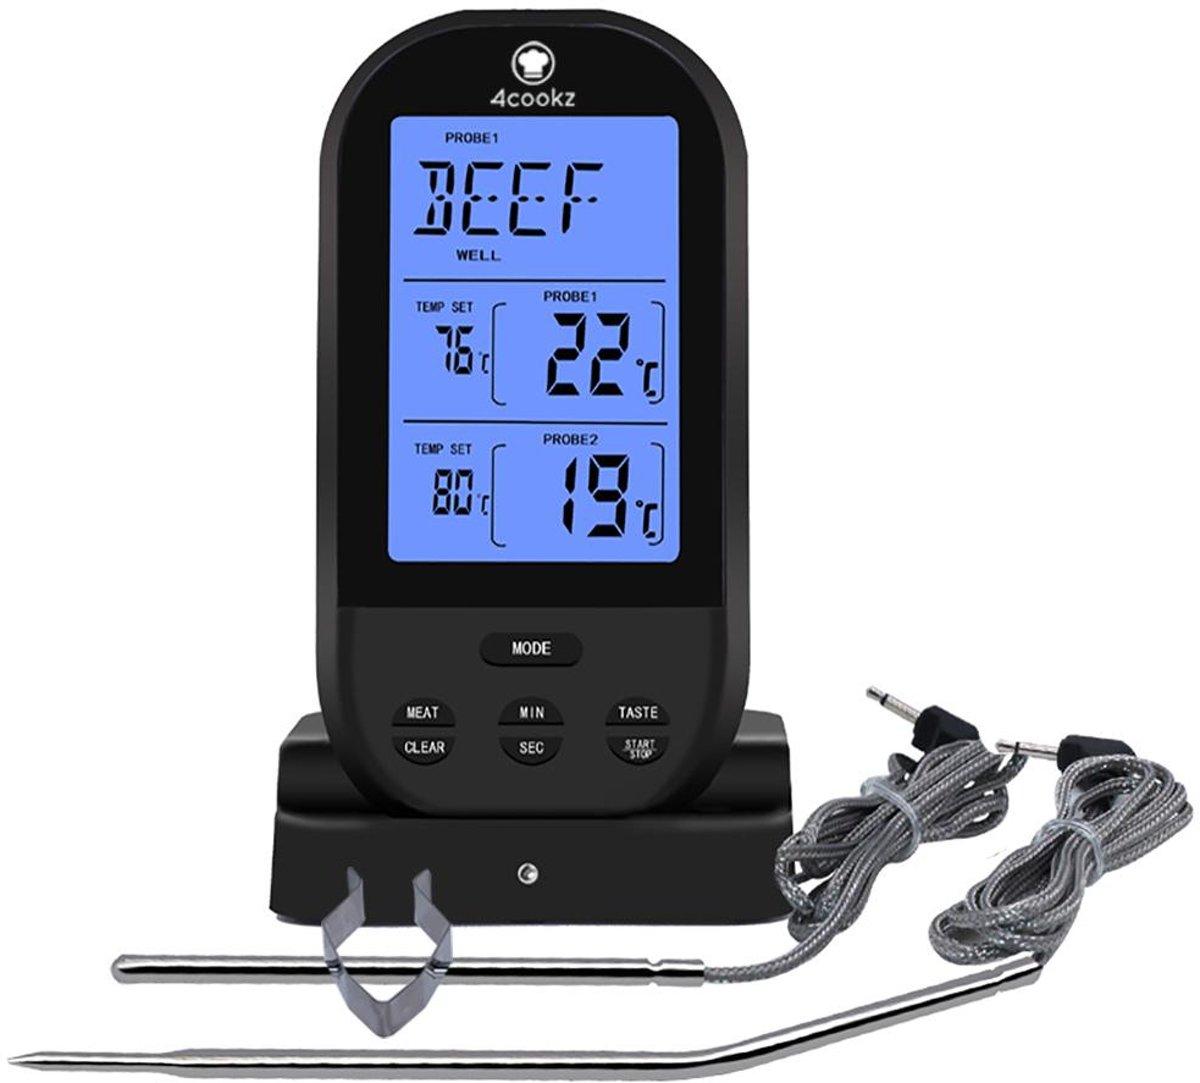 4cookz 2 sensoren draadloze BBQ thermometer - Zwart - 0-250 graden kopen